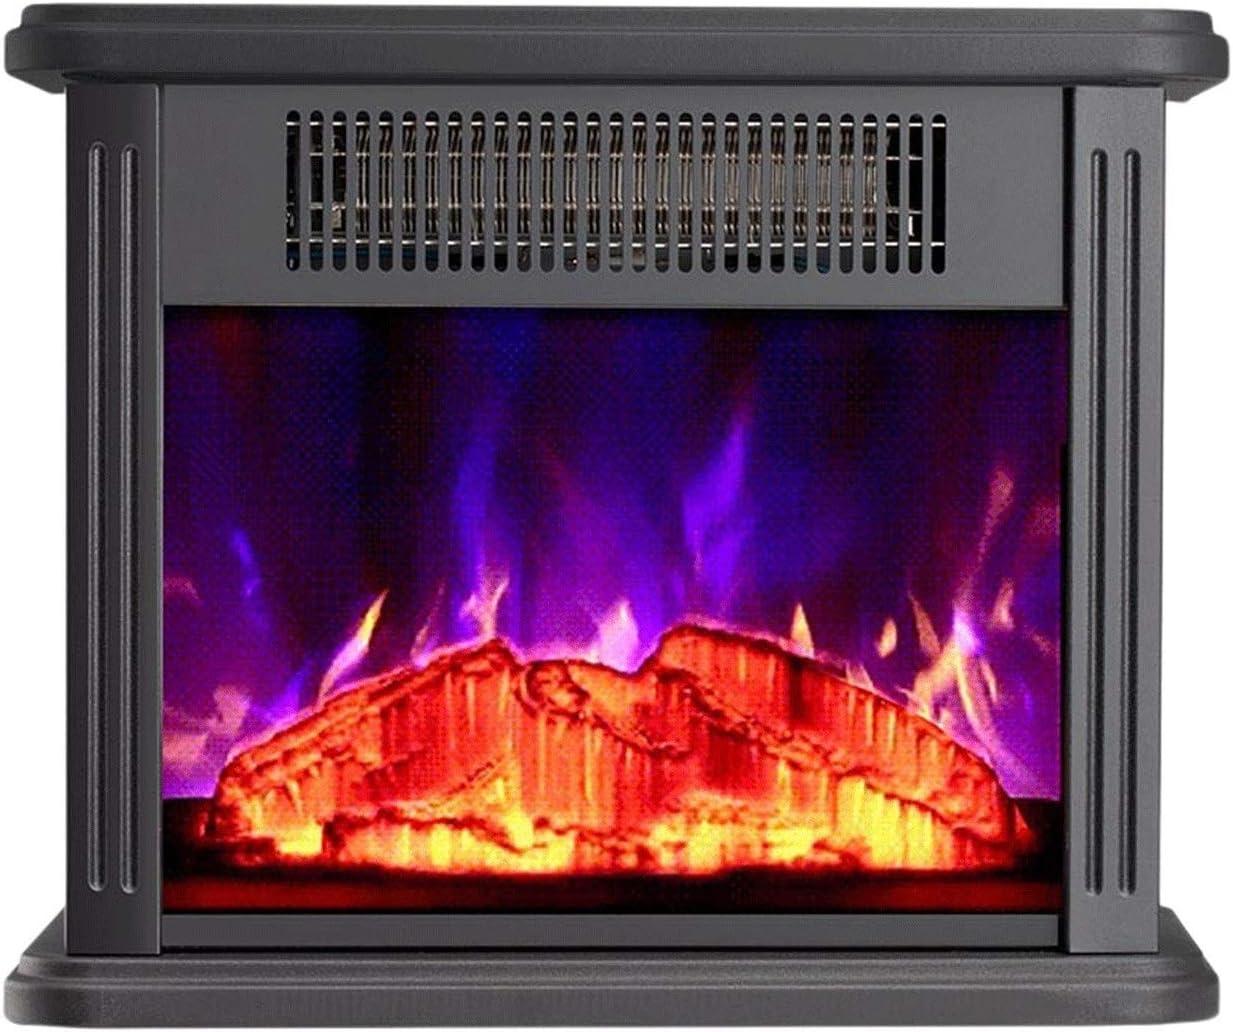 quality assurance KKLL Fireplace Electric Stove discount Fire Heater Energy Saving